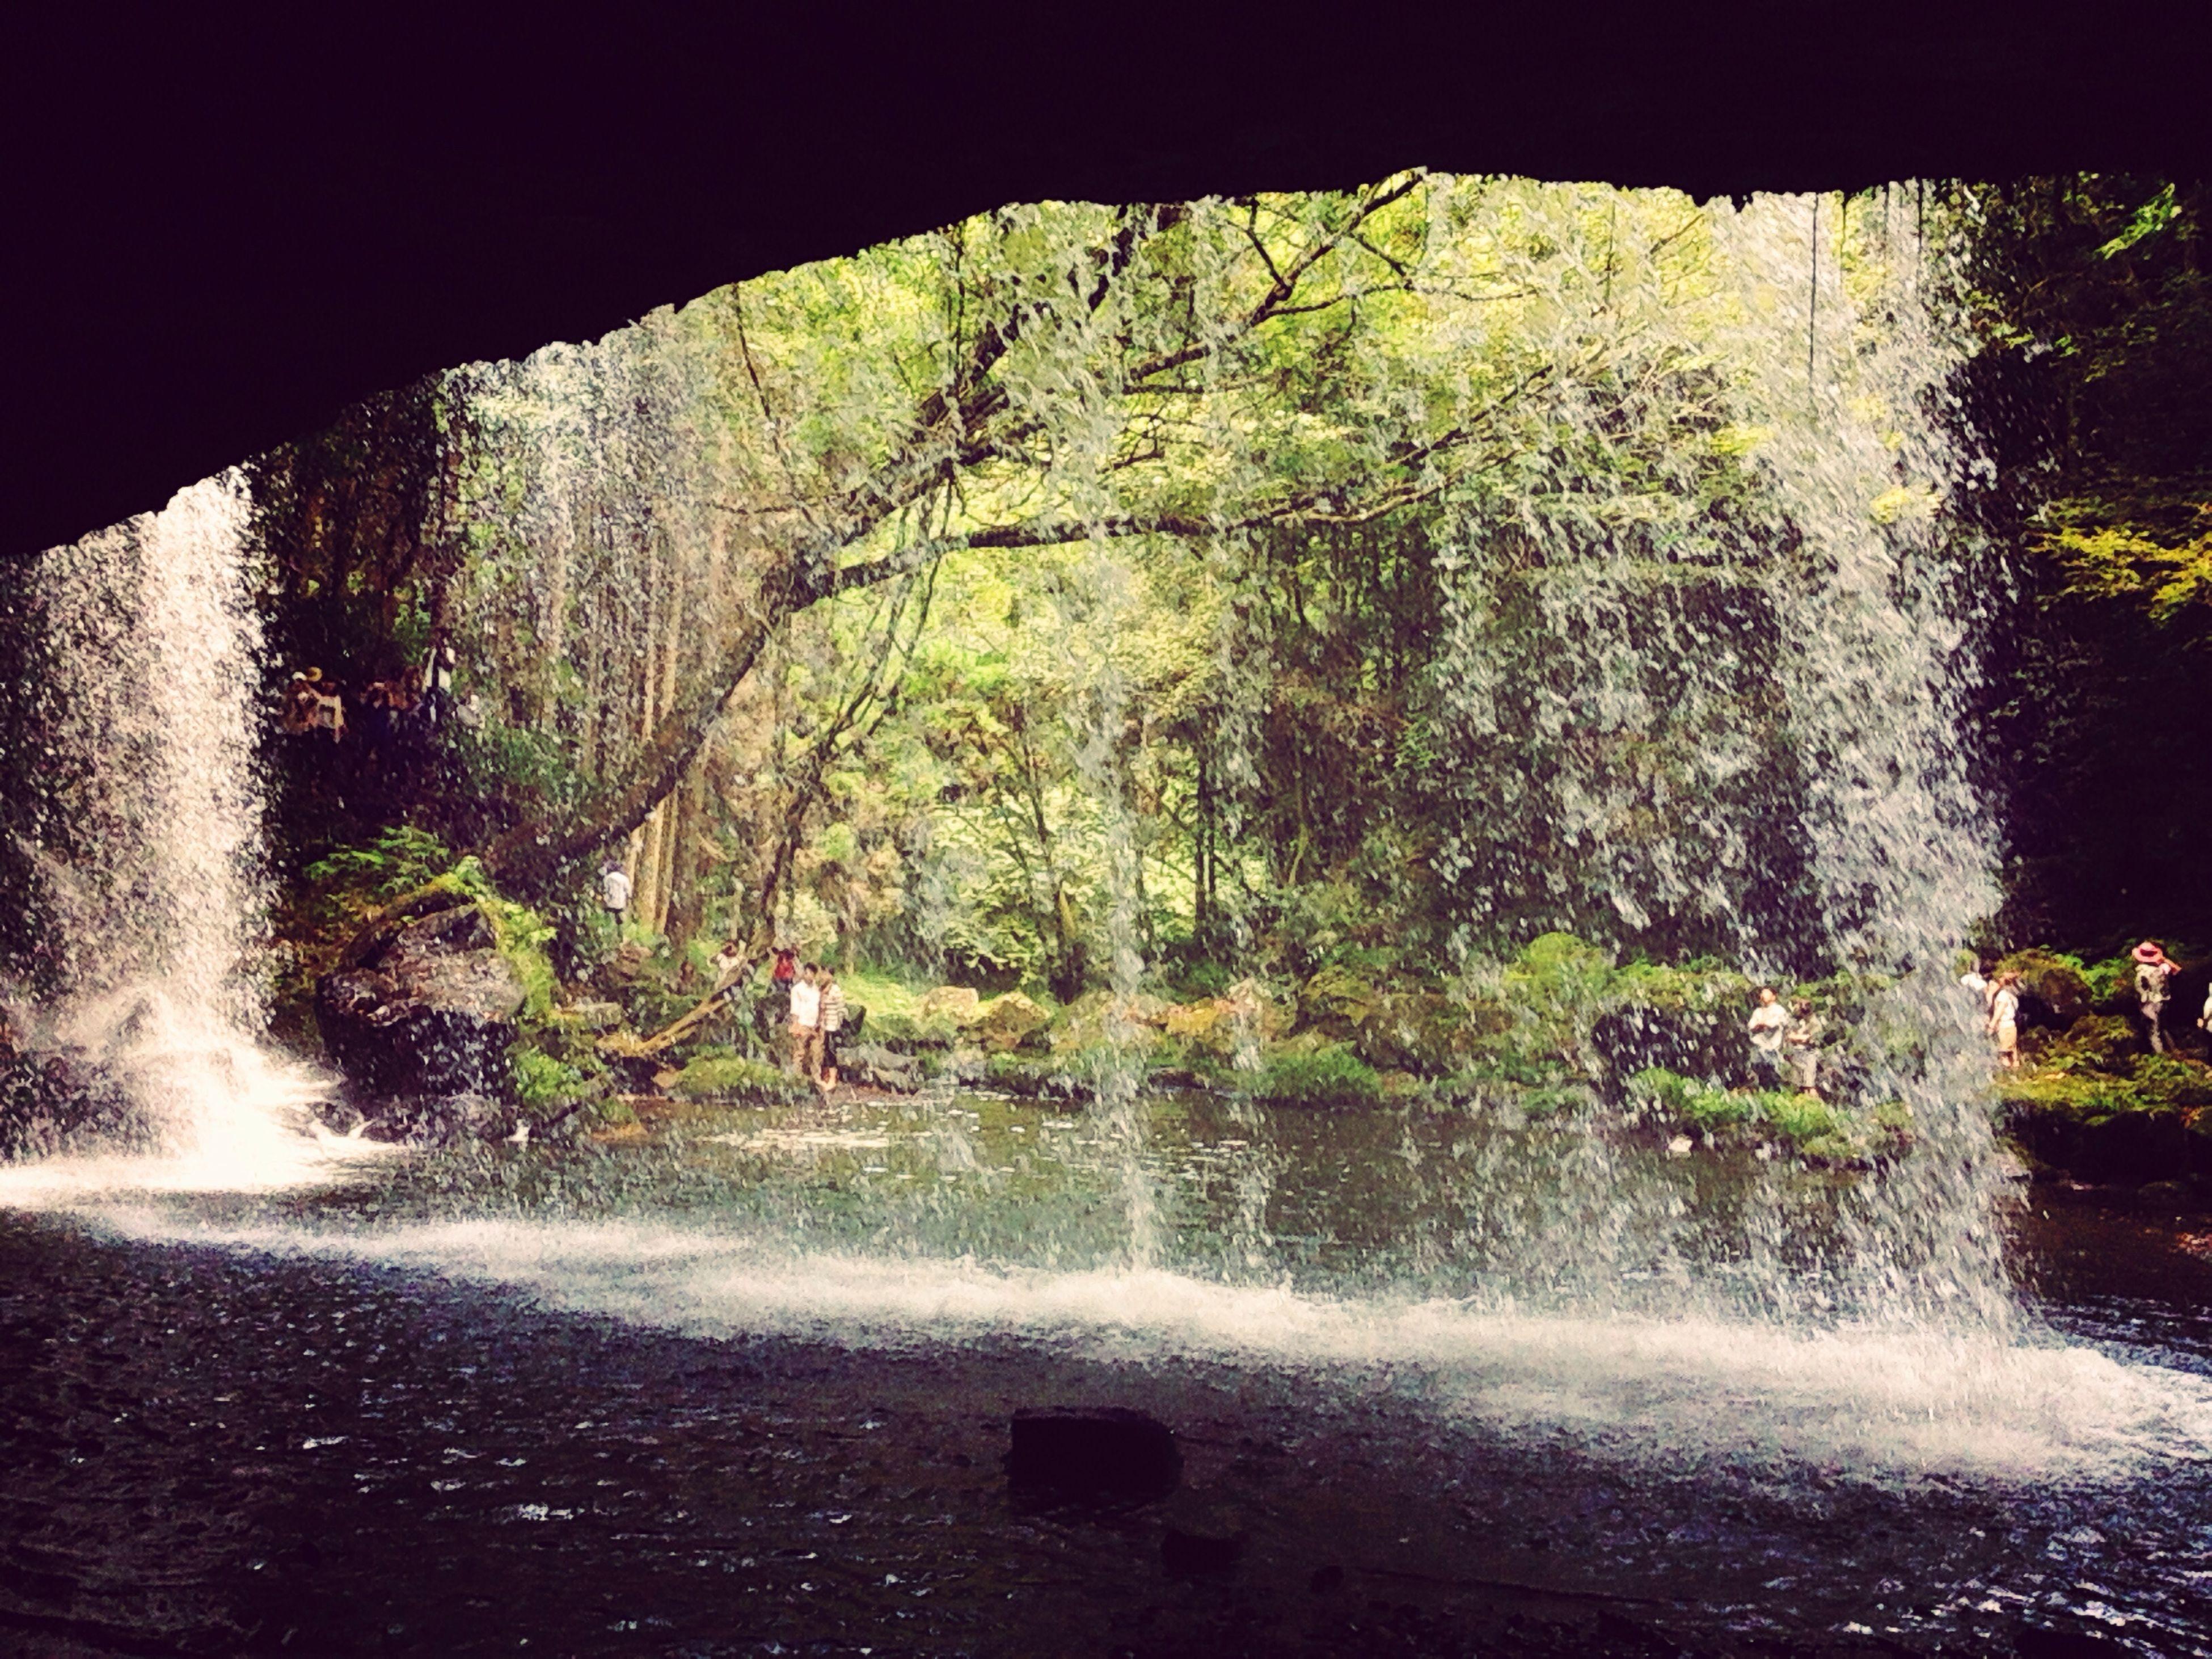 滝 滝の裏 小国 阿蘇